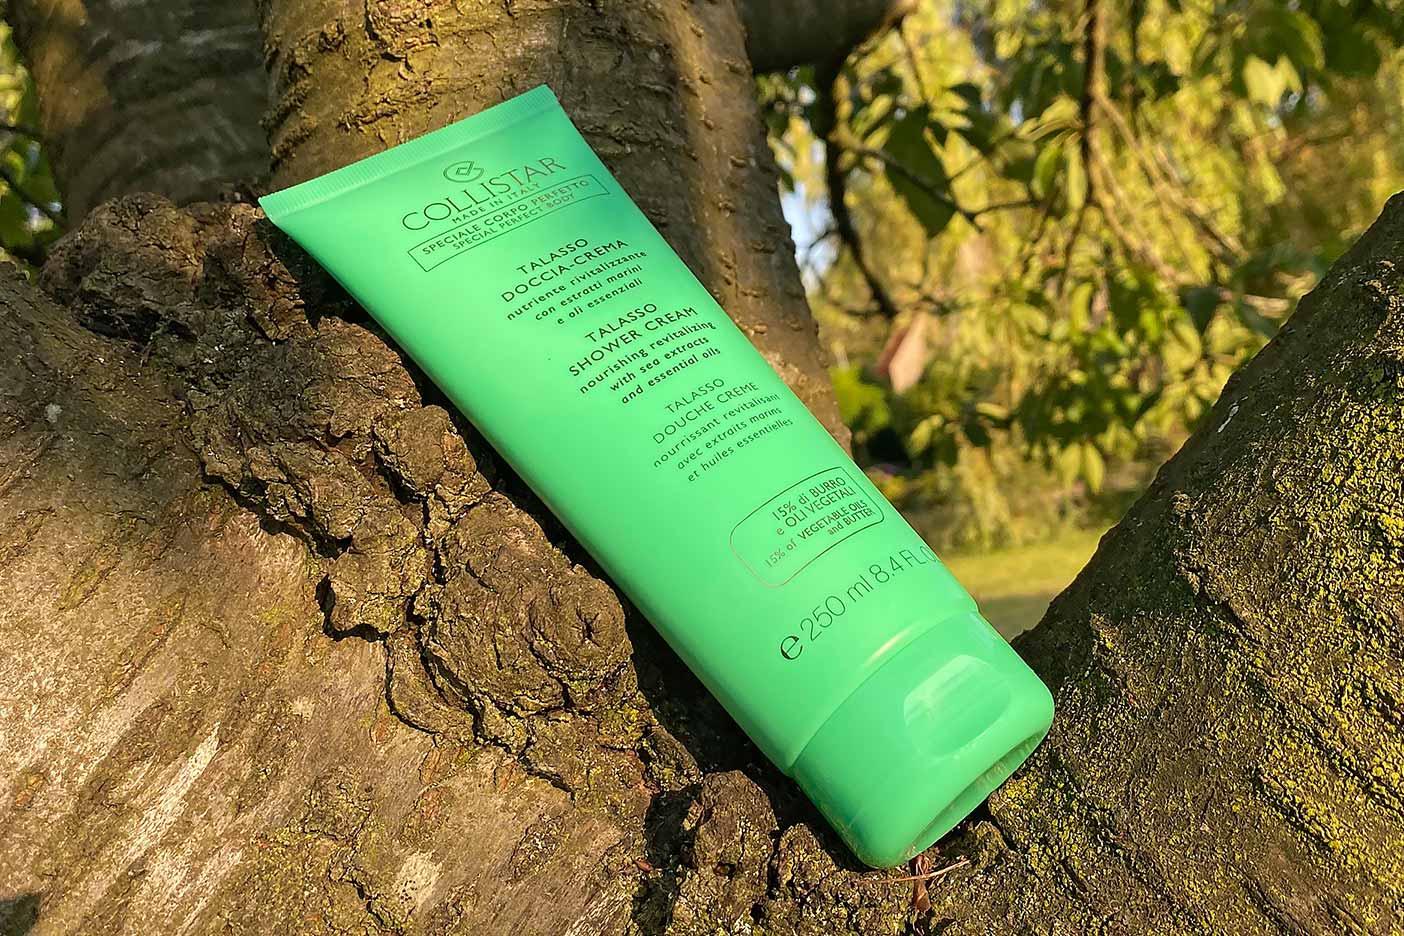 collistar talasso shower cream review